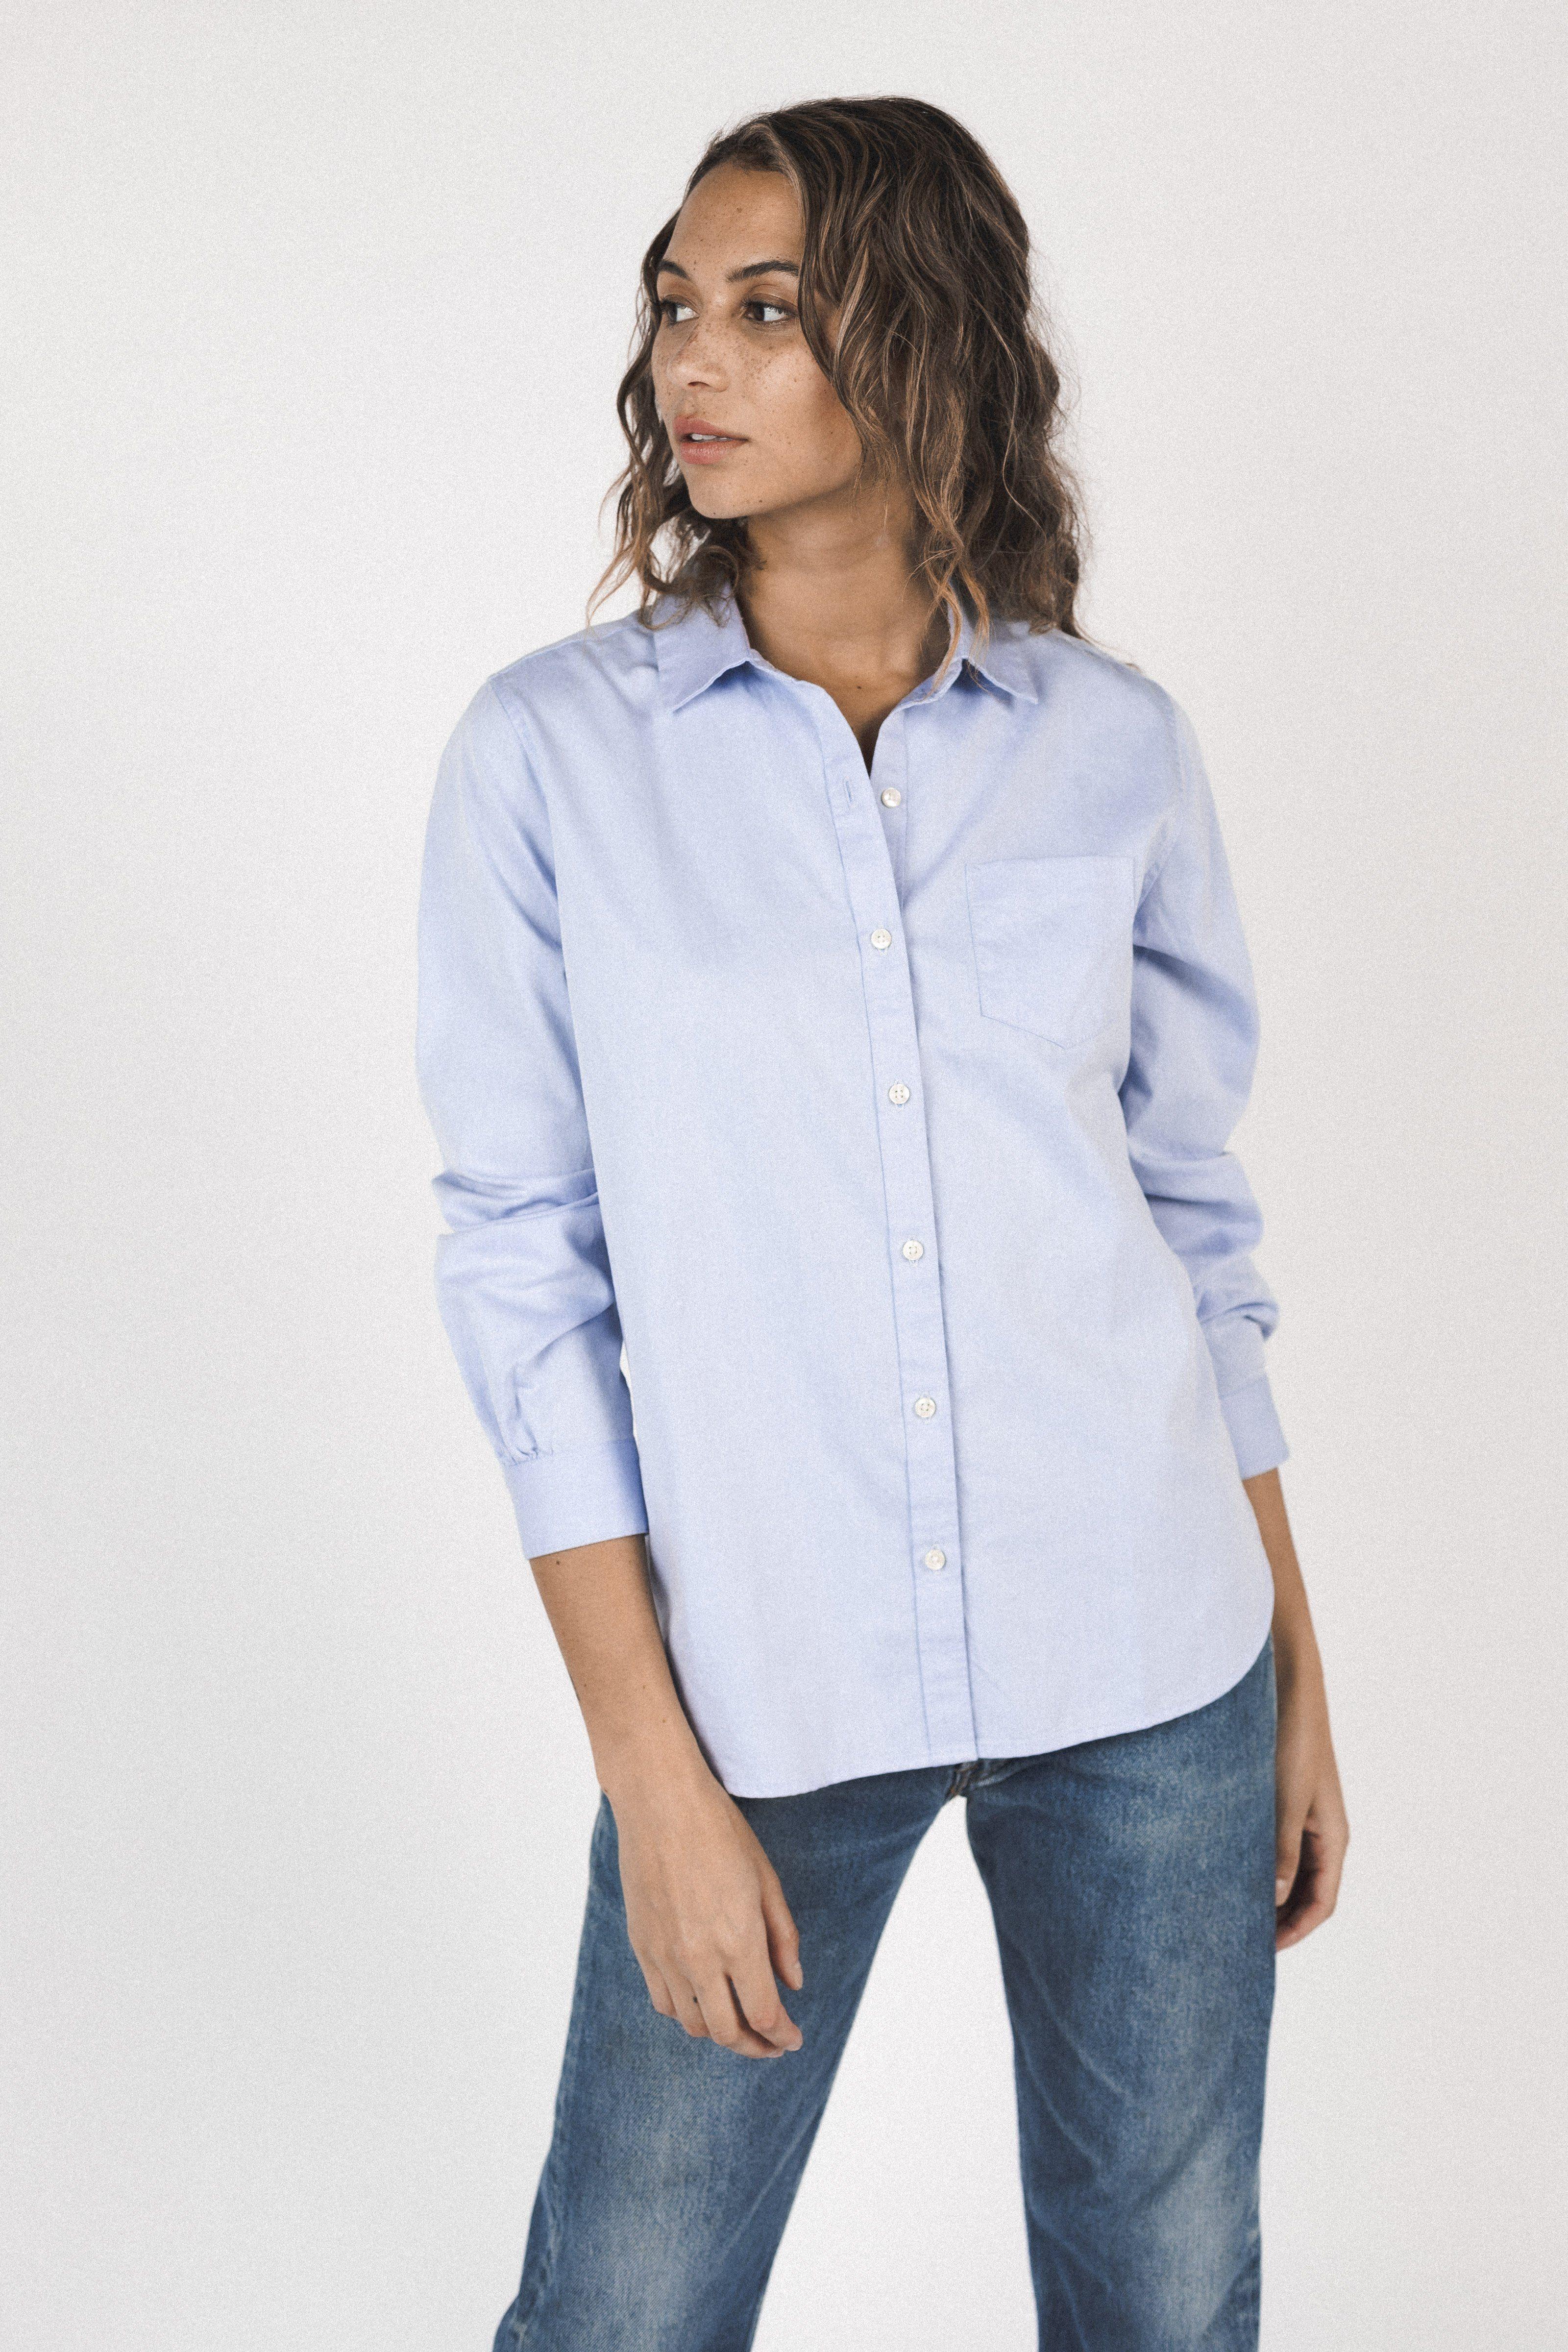 Grace Classic Shirt LIGHT BLUE by Trovata - 1